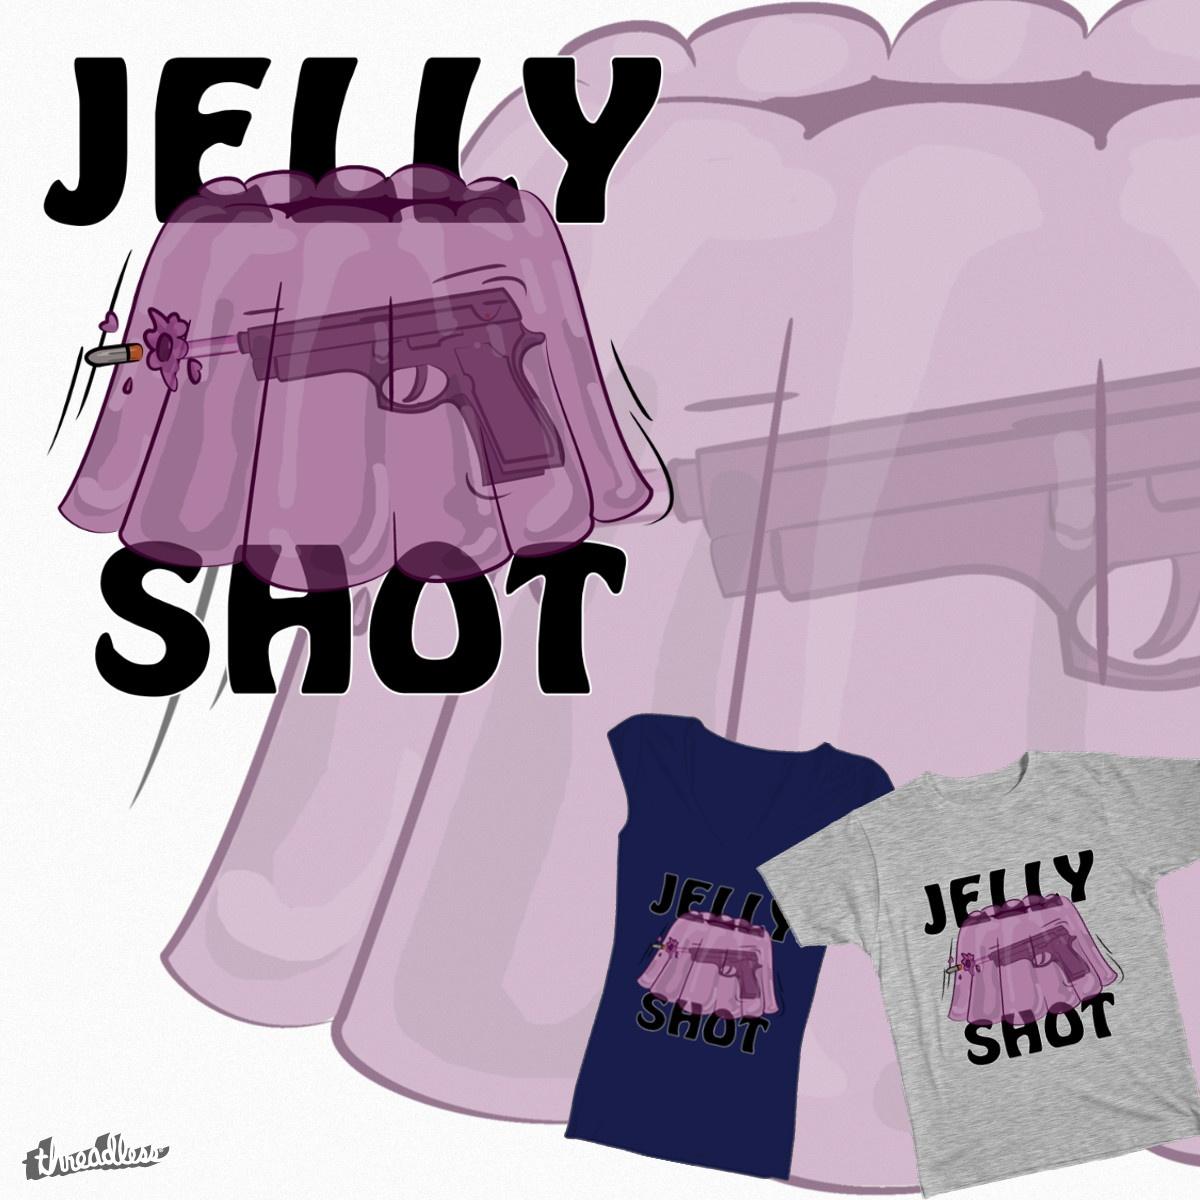 Jelly Shot by Kipke on Threadless